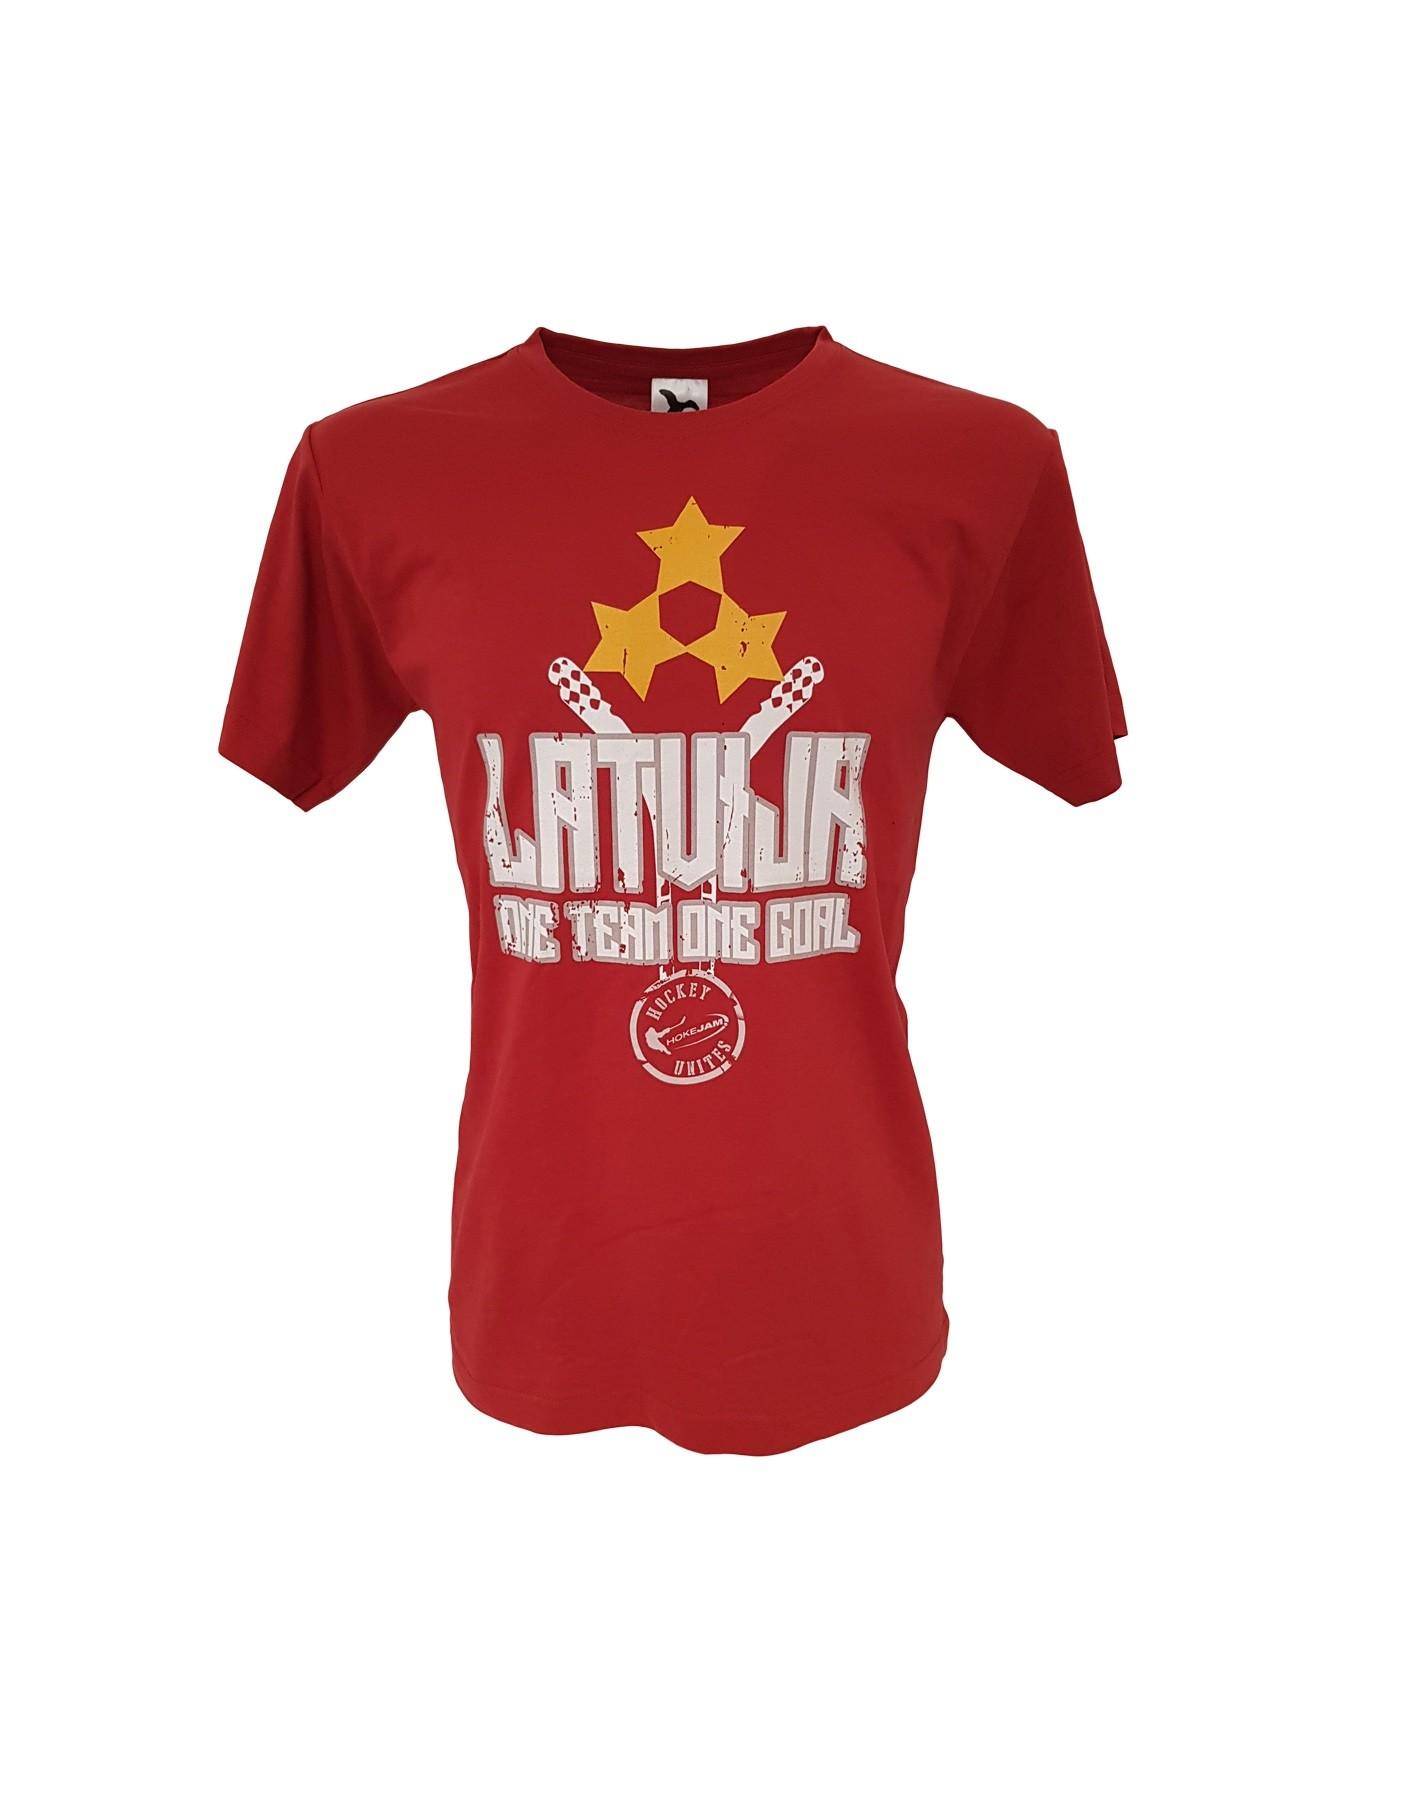 HOKEJAM.LV Latvija One Team One Goal Pieaugušo T-Krekls